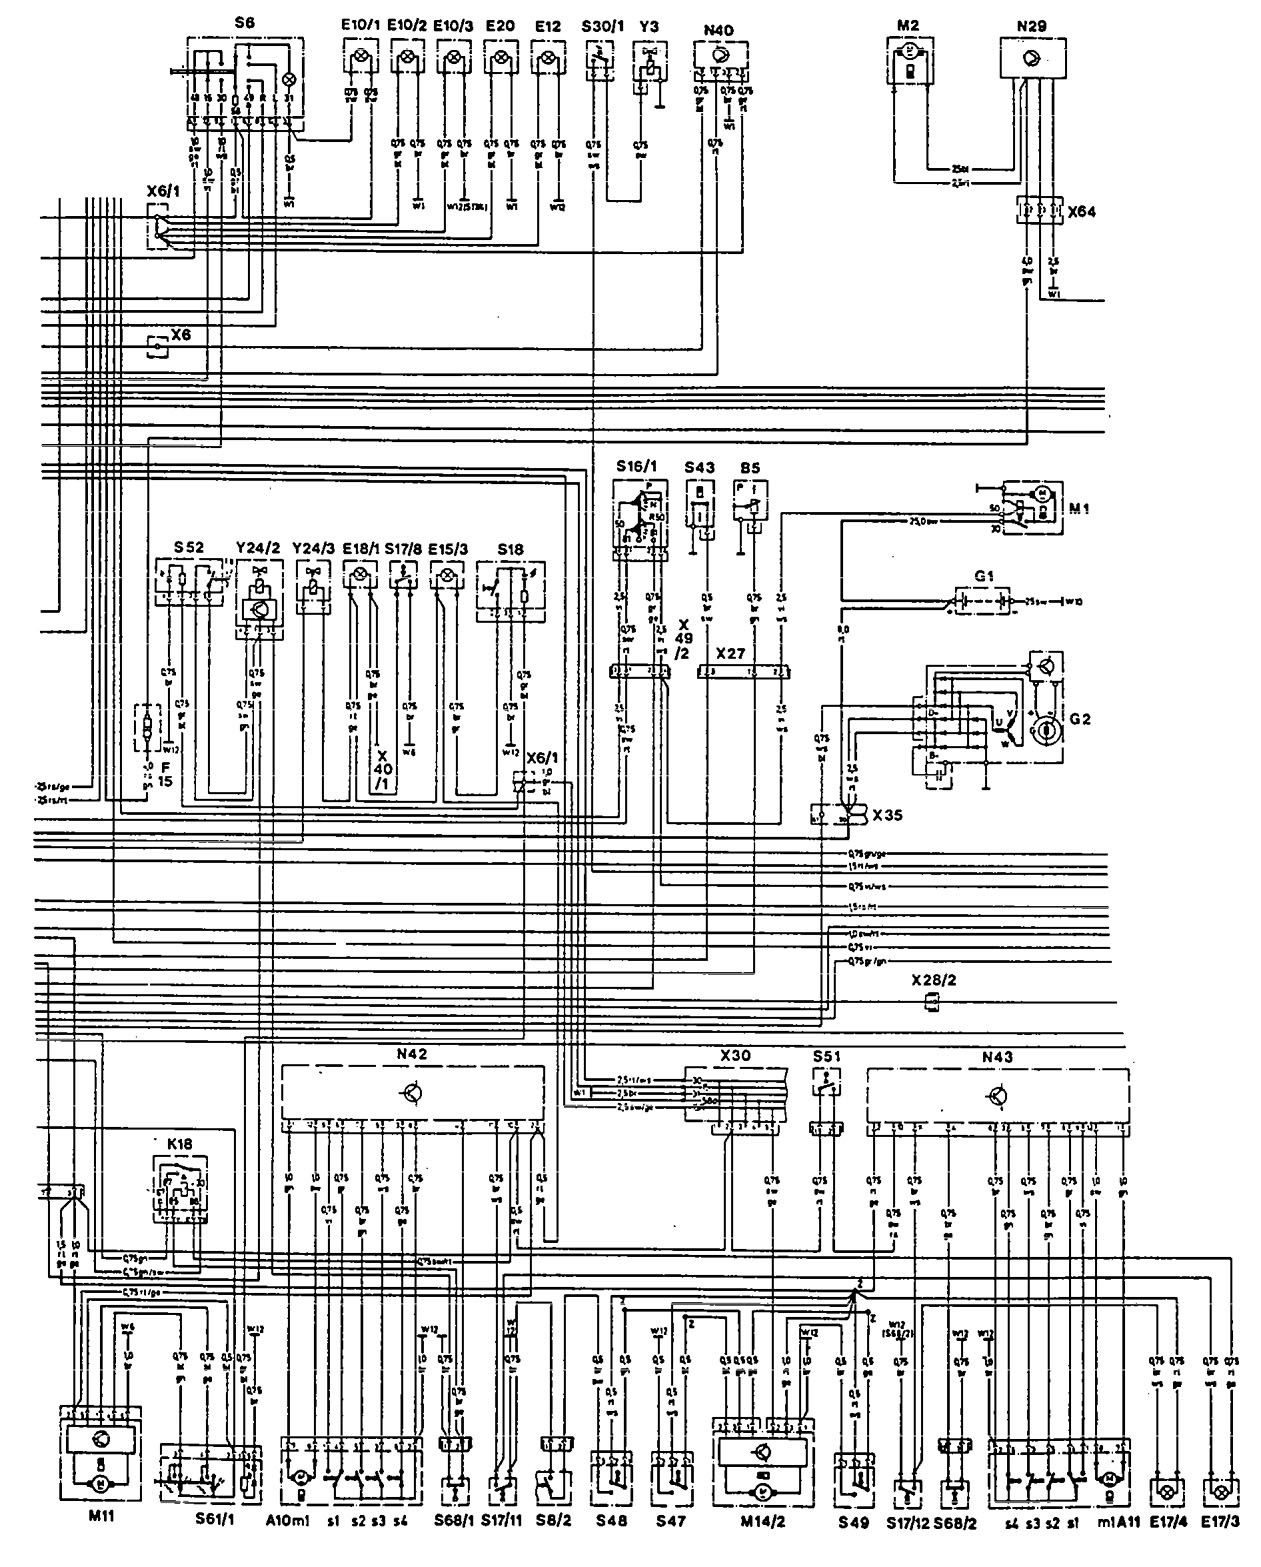 Mercedes Benz 300ce 1992 1993 Wiring Diagrams Cooling Fans Fan Diagram